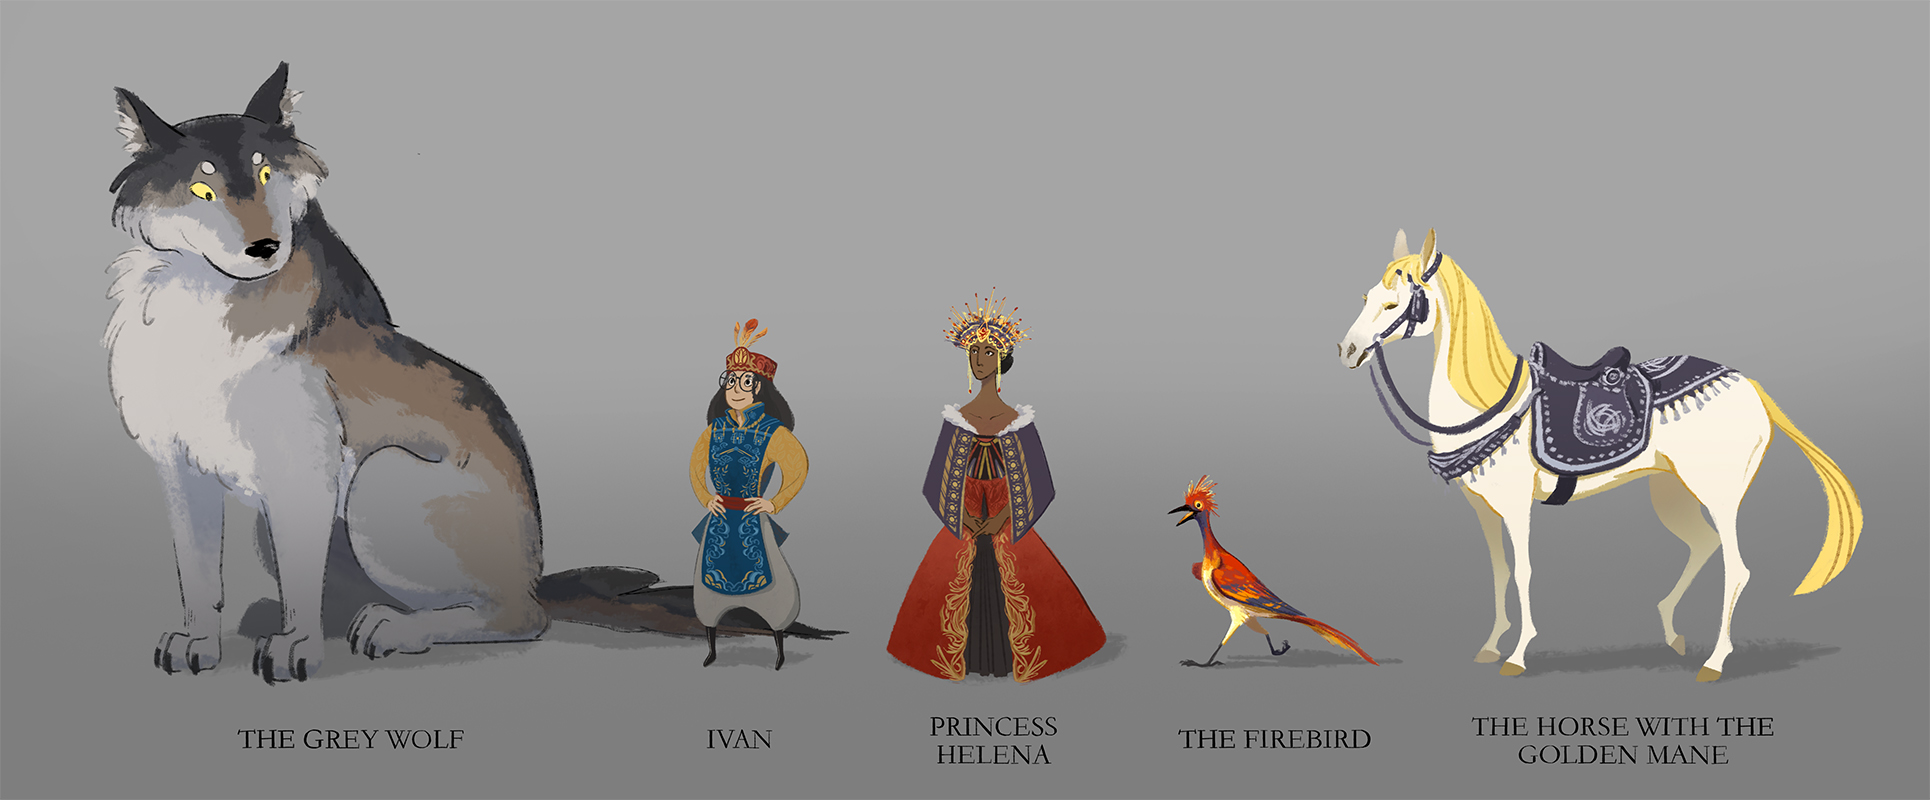 Firebird characters v2 copy.jpg